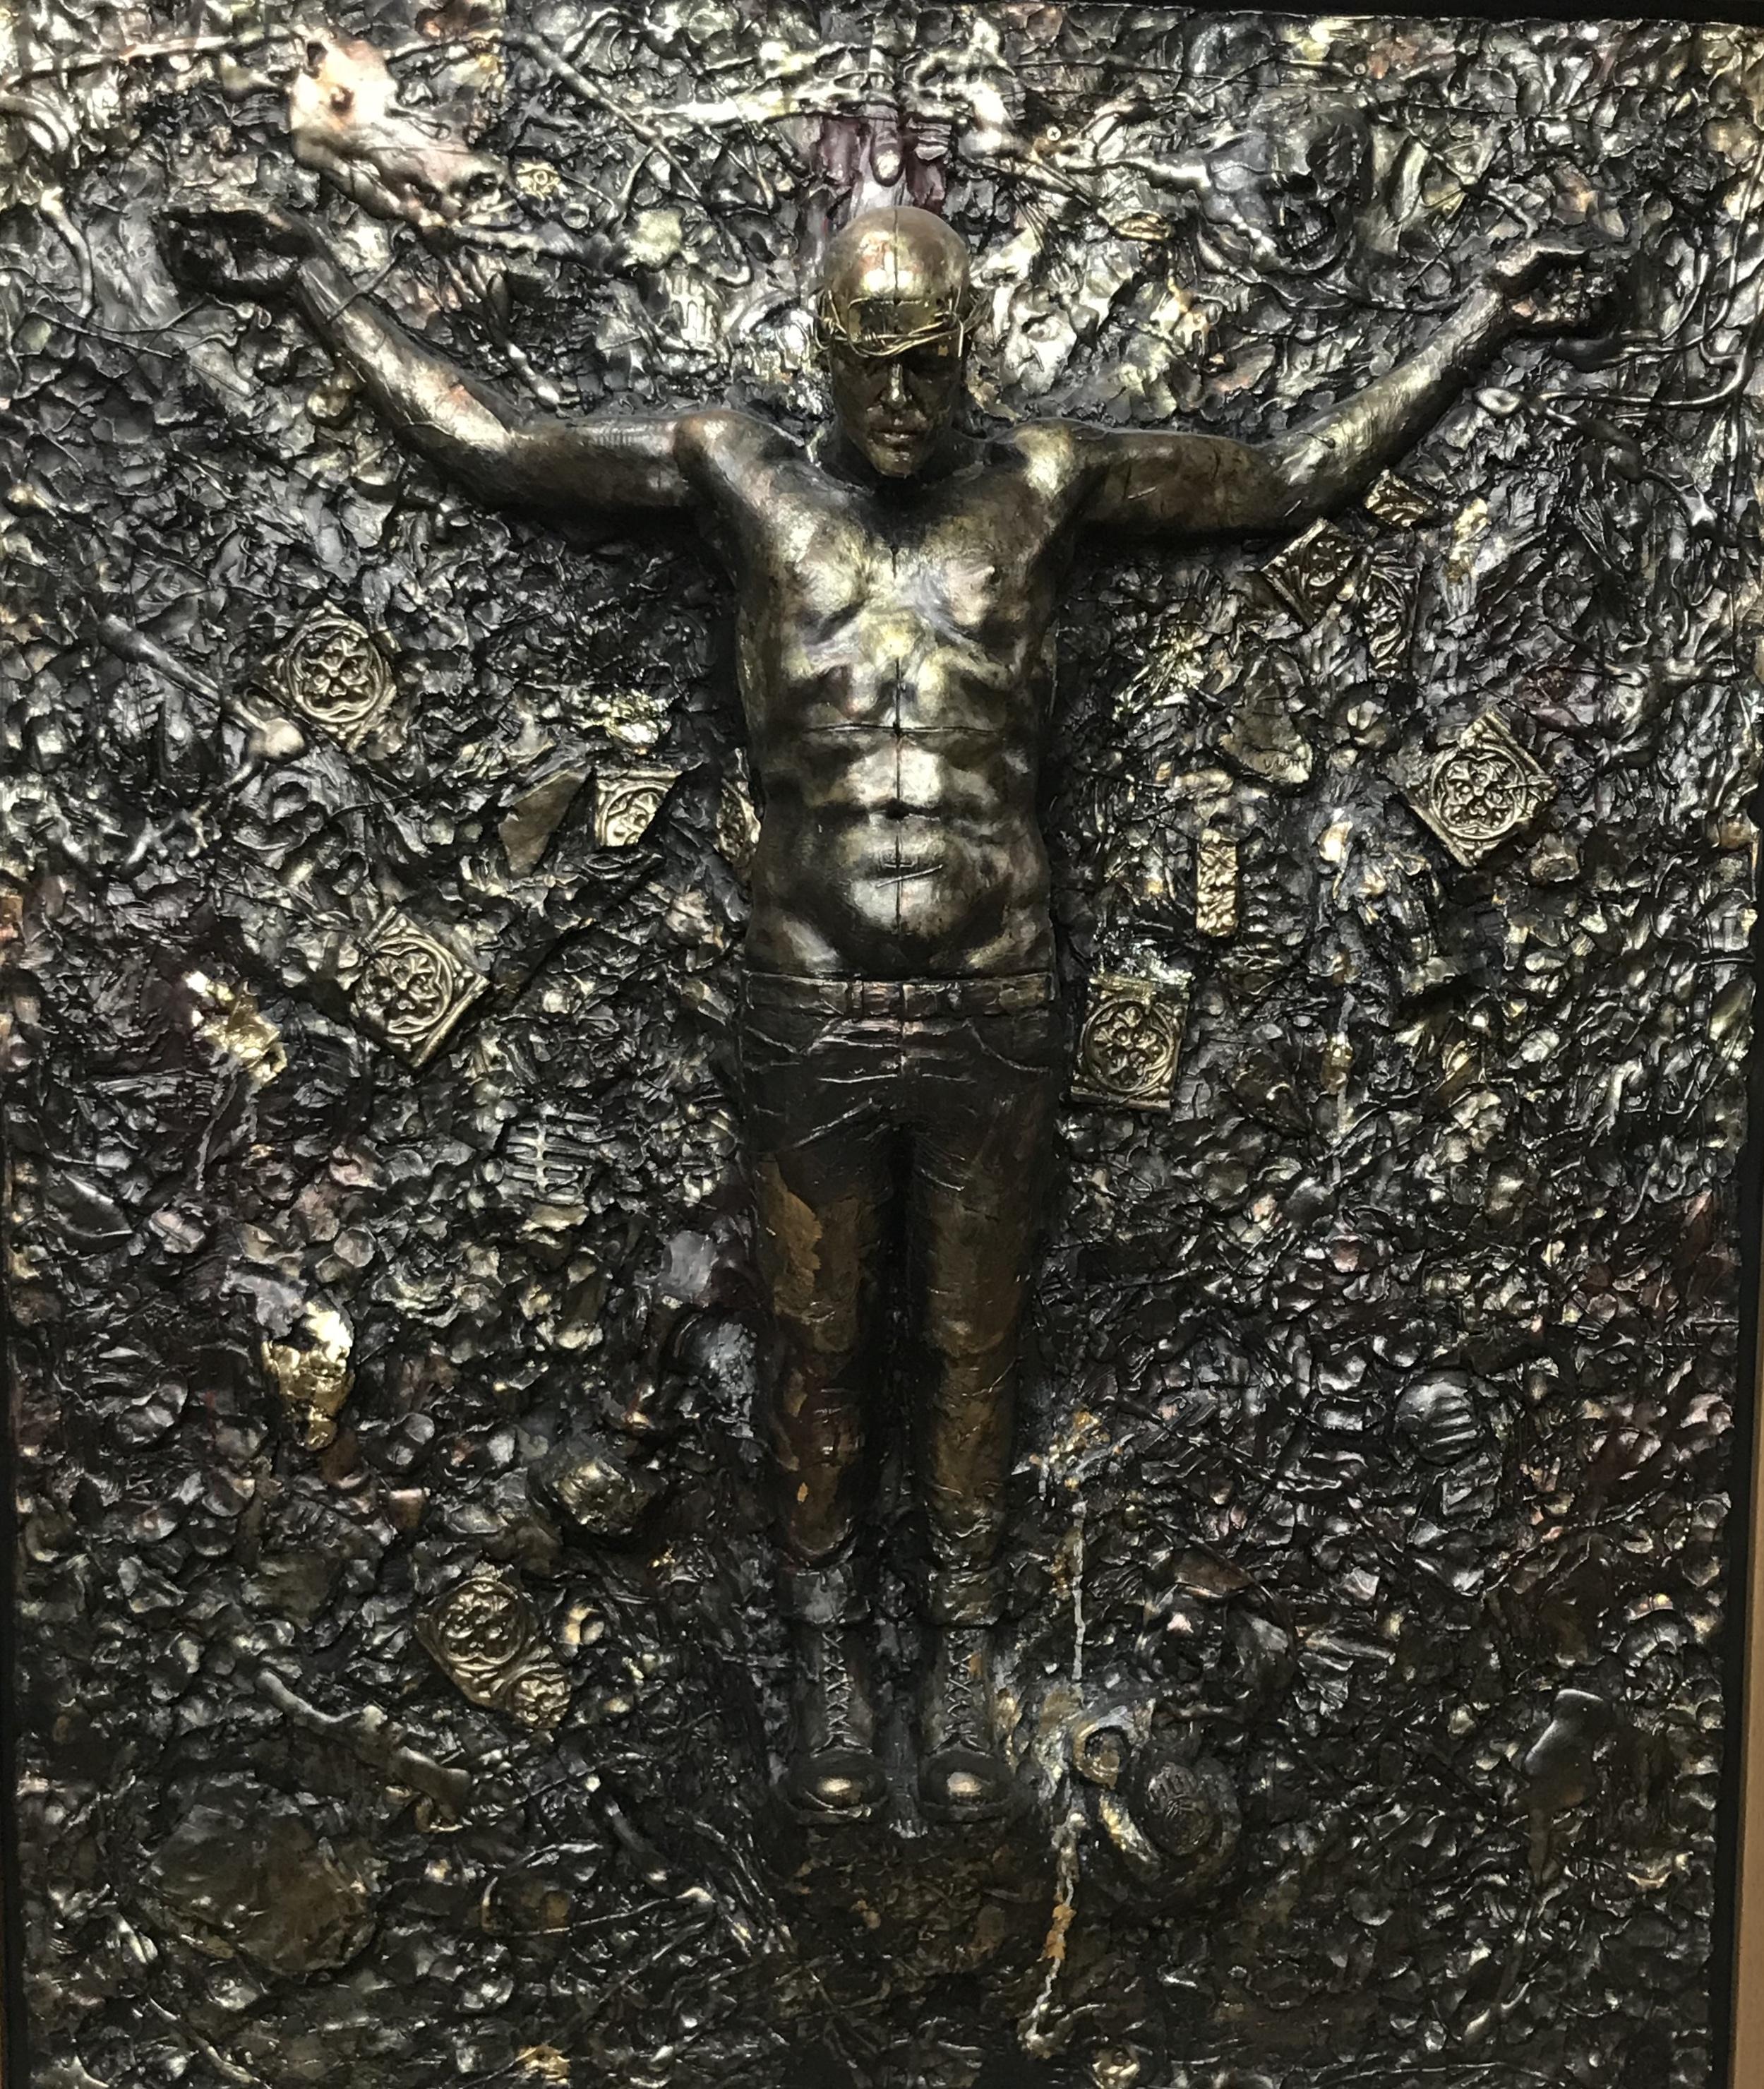 Mixed Media Sculpture by Dean Kemp depicting a modern day Christ